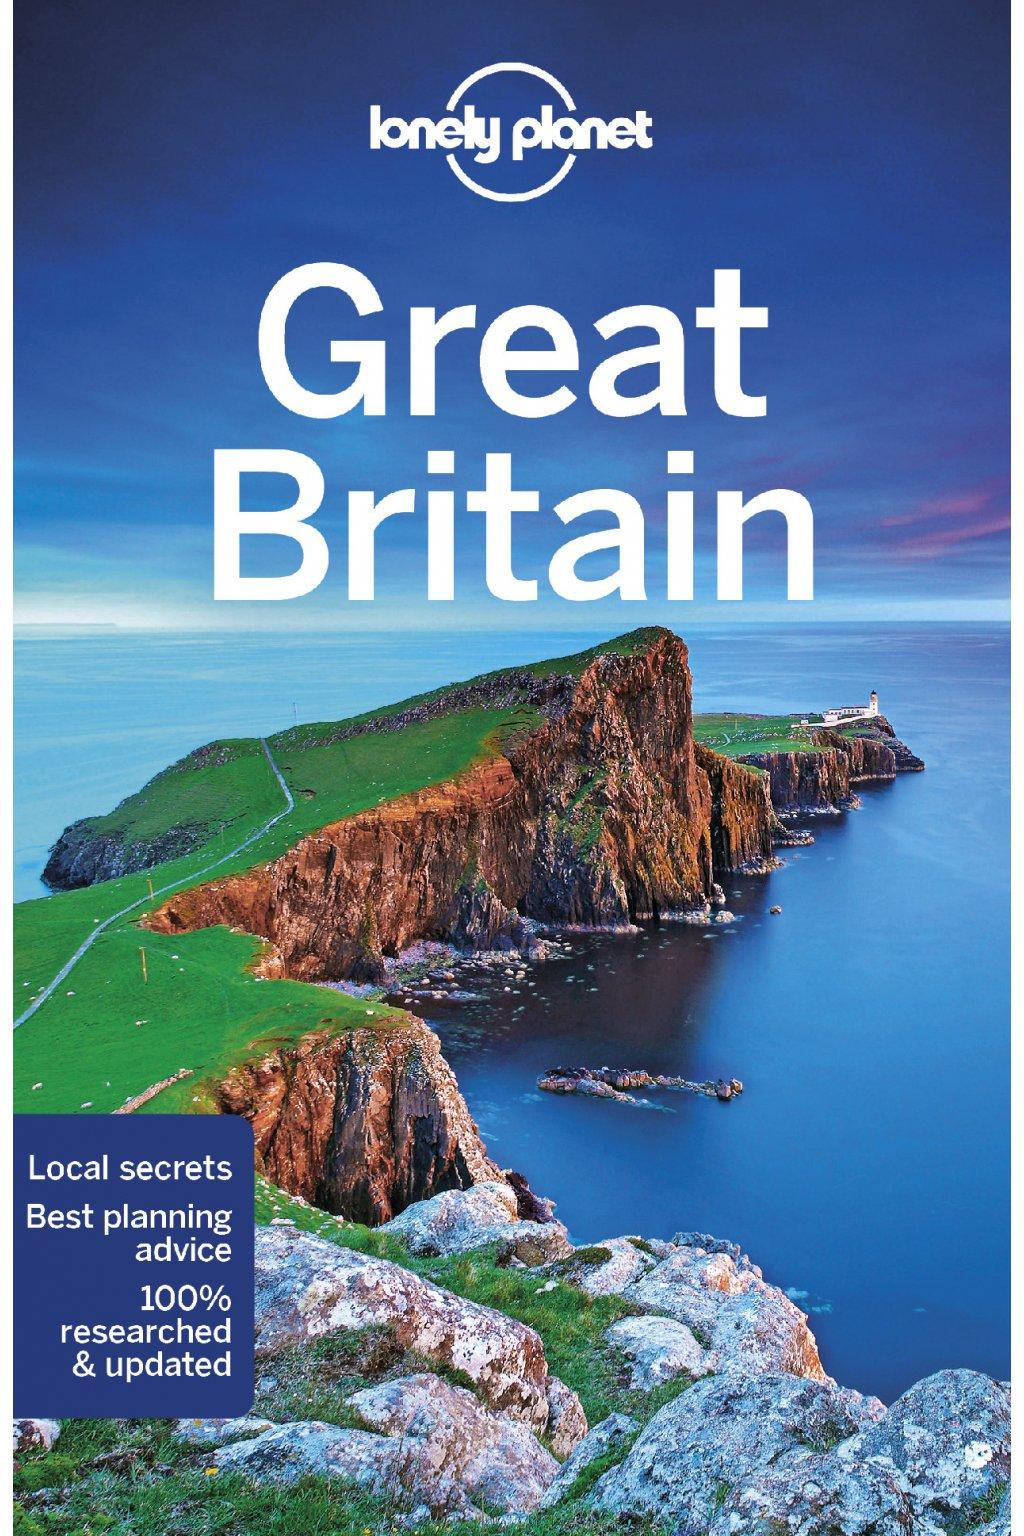 55510 Great Britain 13 9781786578068